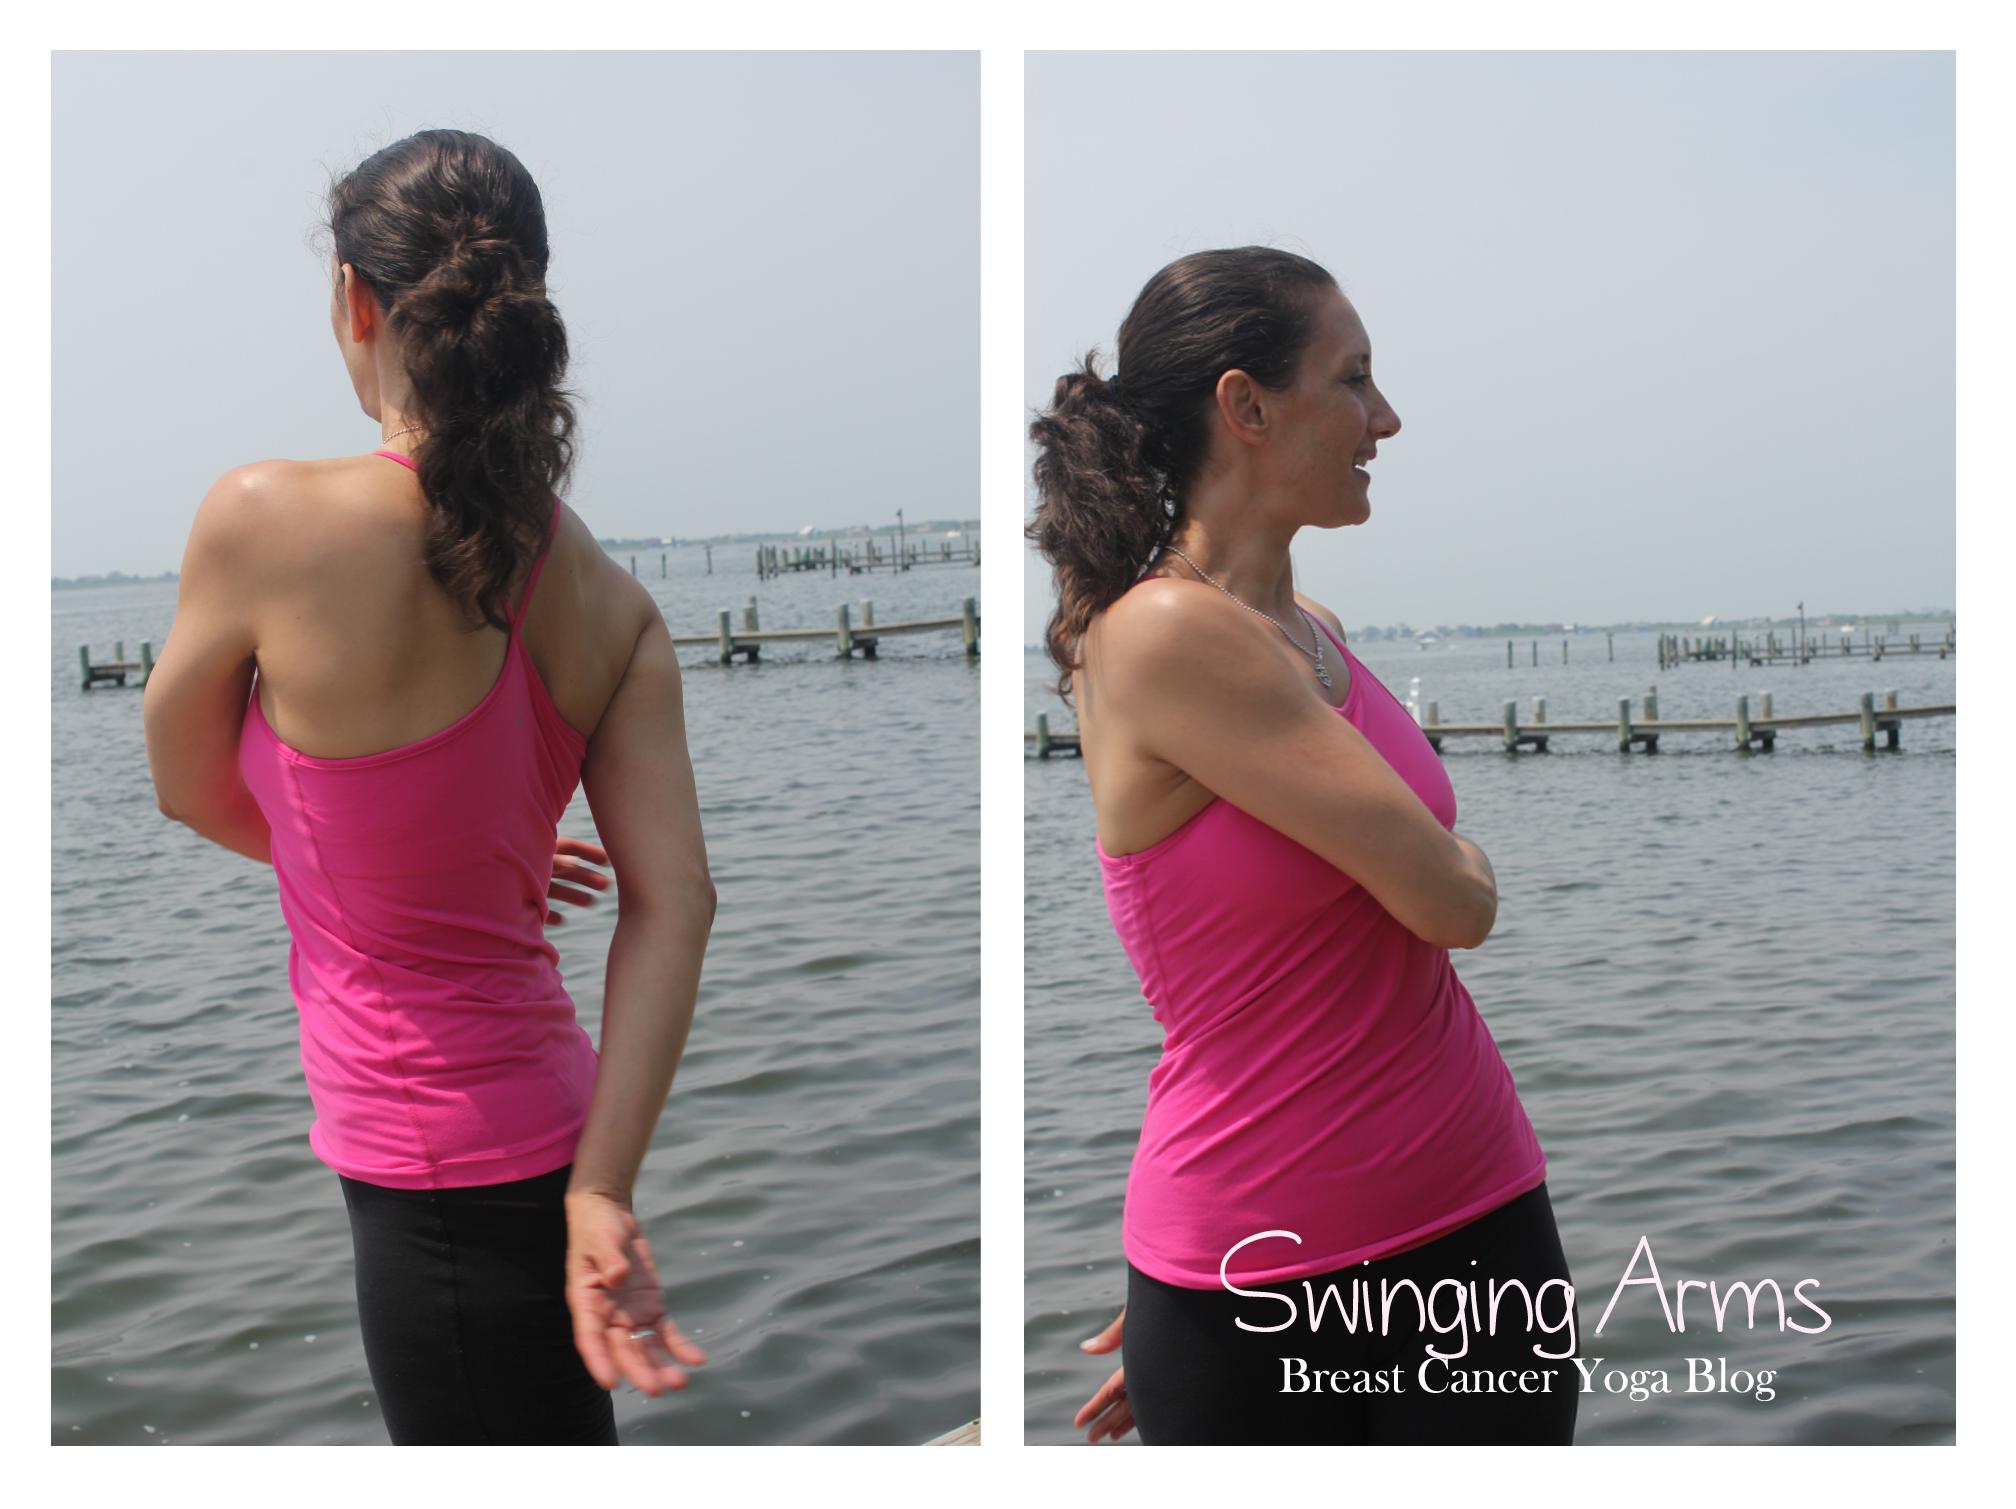 Benefits of qigong arm swinging